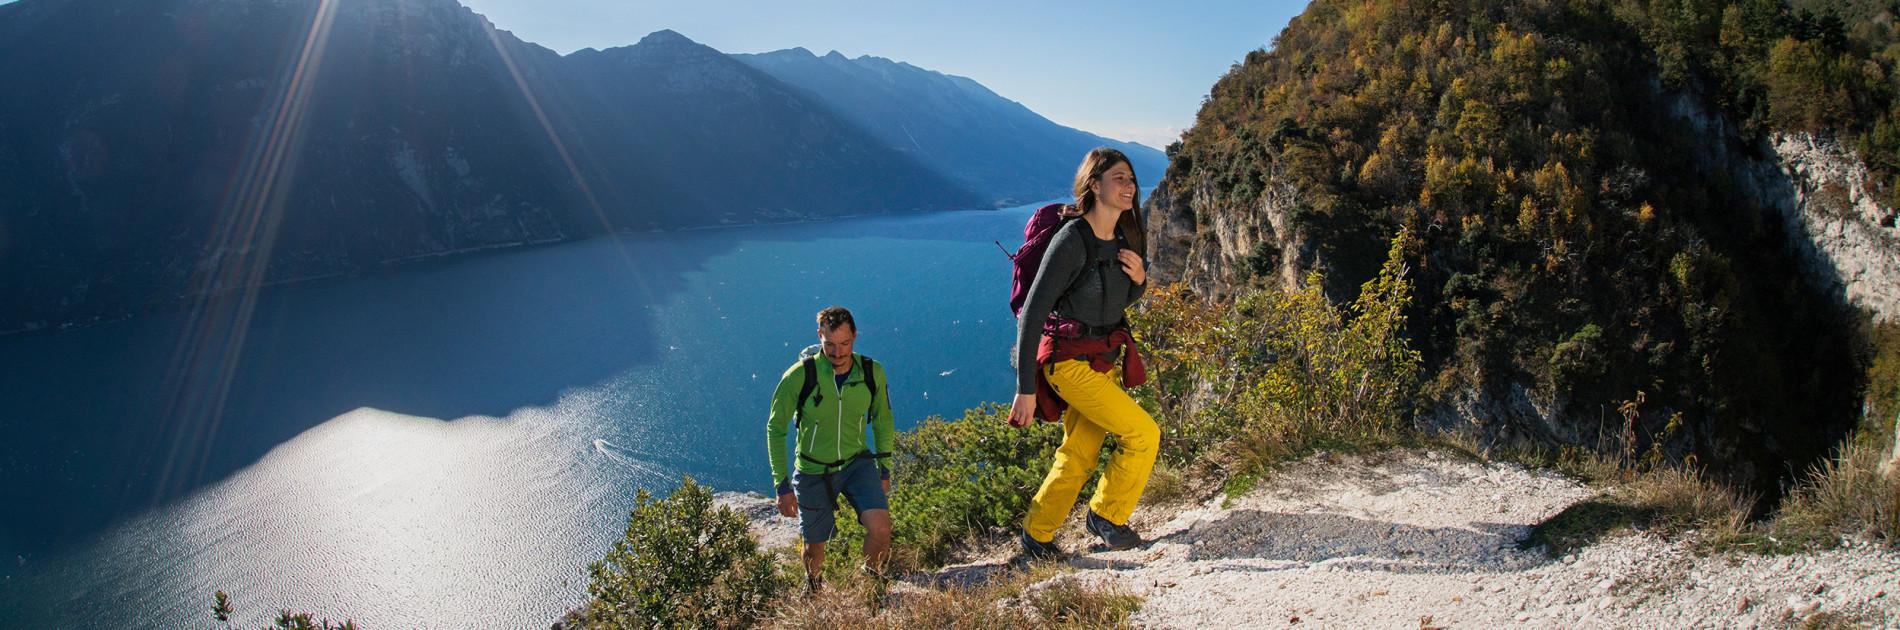 Wanderszene bei Pregasina, Gardasee, Trentino, Italien.